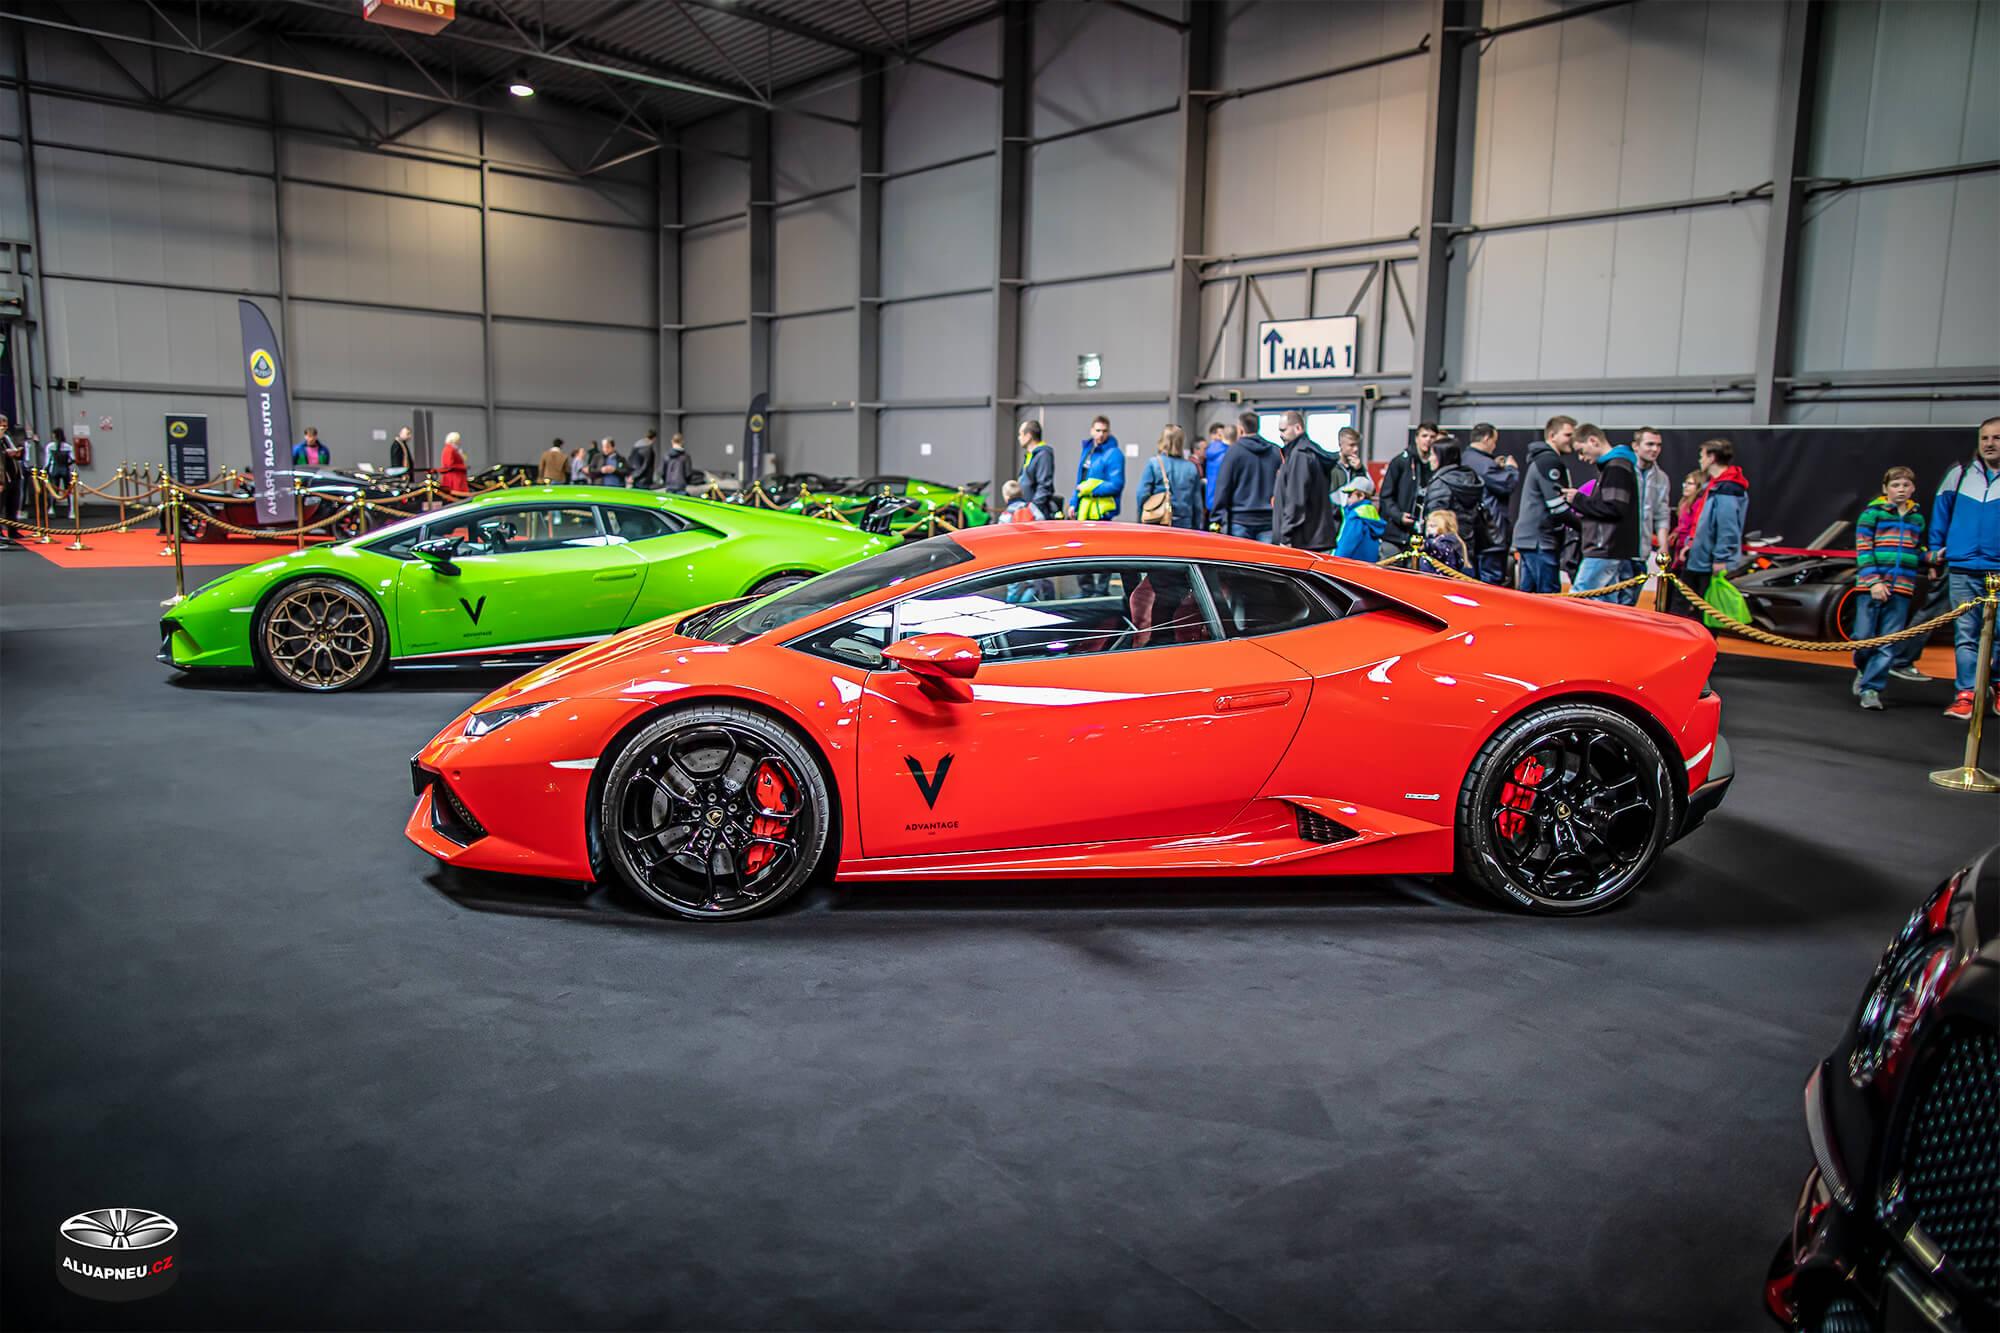 Rudé Lamborghini - černá alu kola Lamborghini - Autosalon Praha 2019 - www.aluapneu.cz